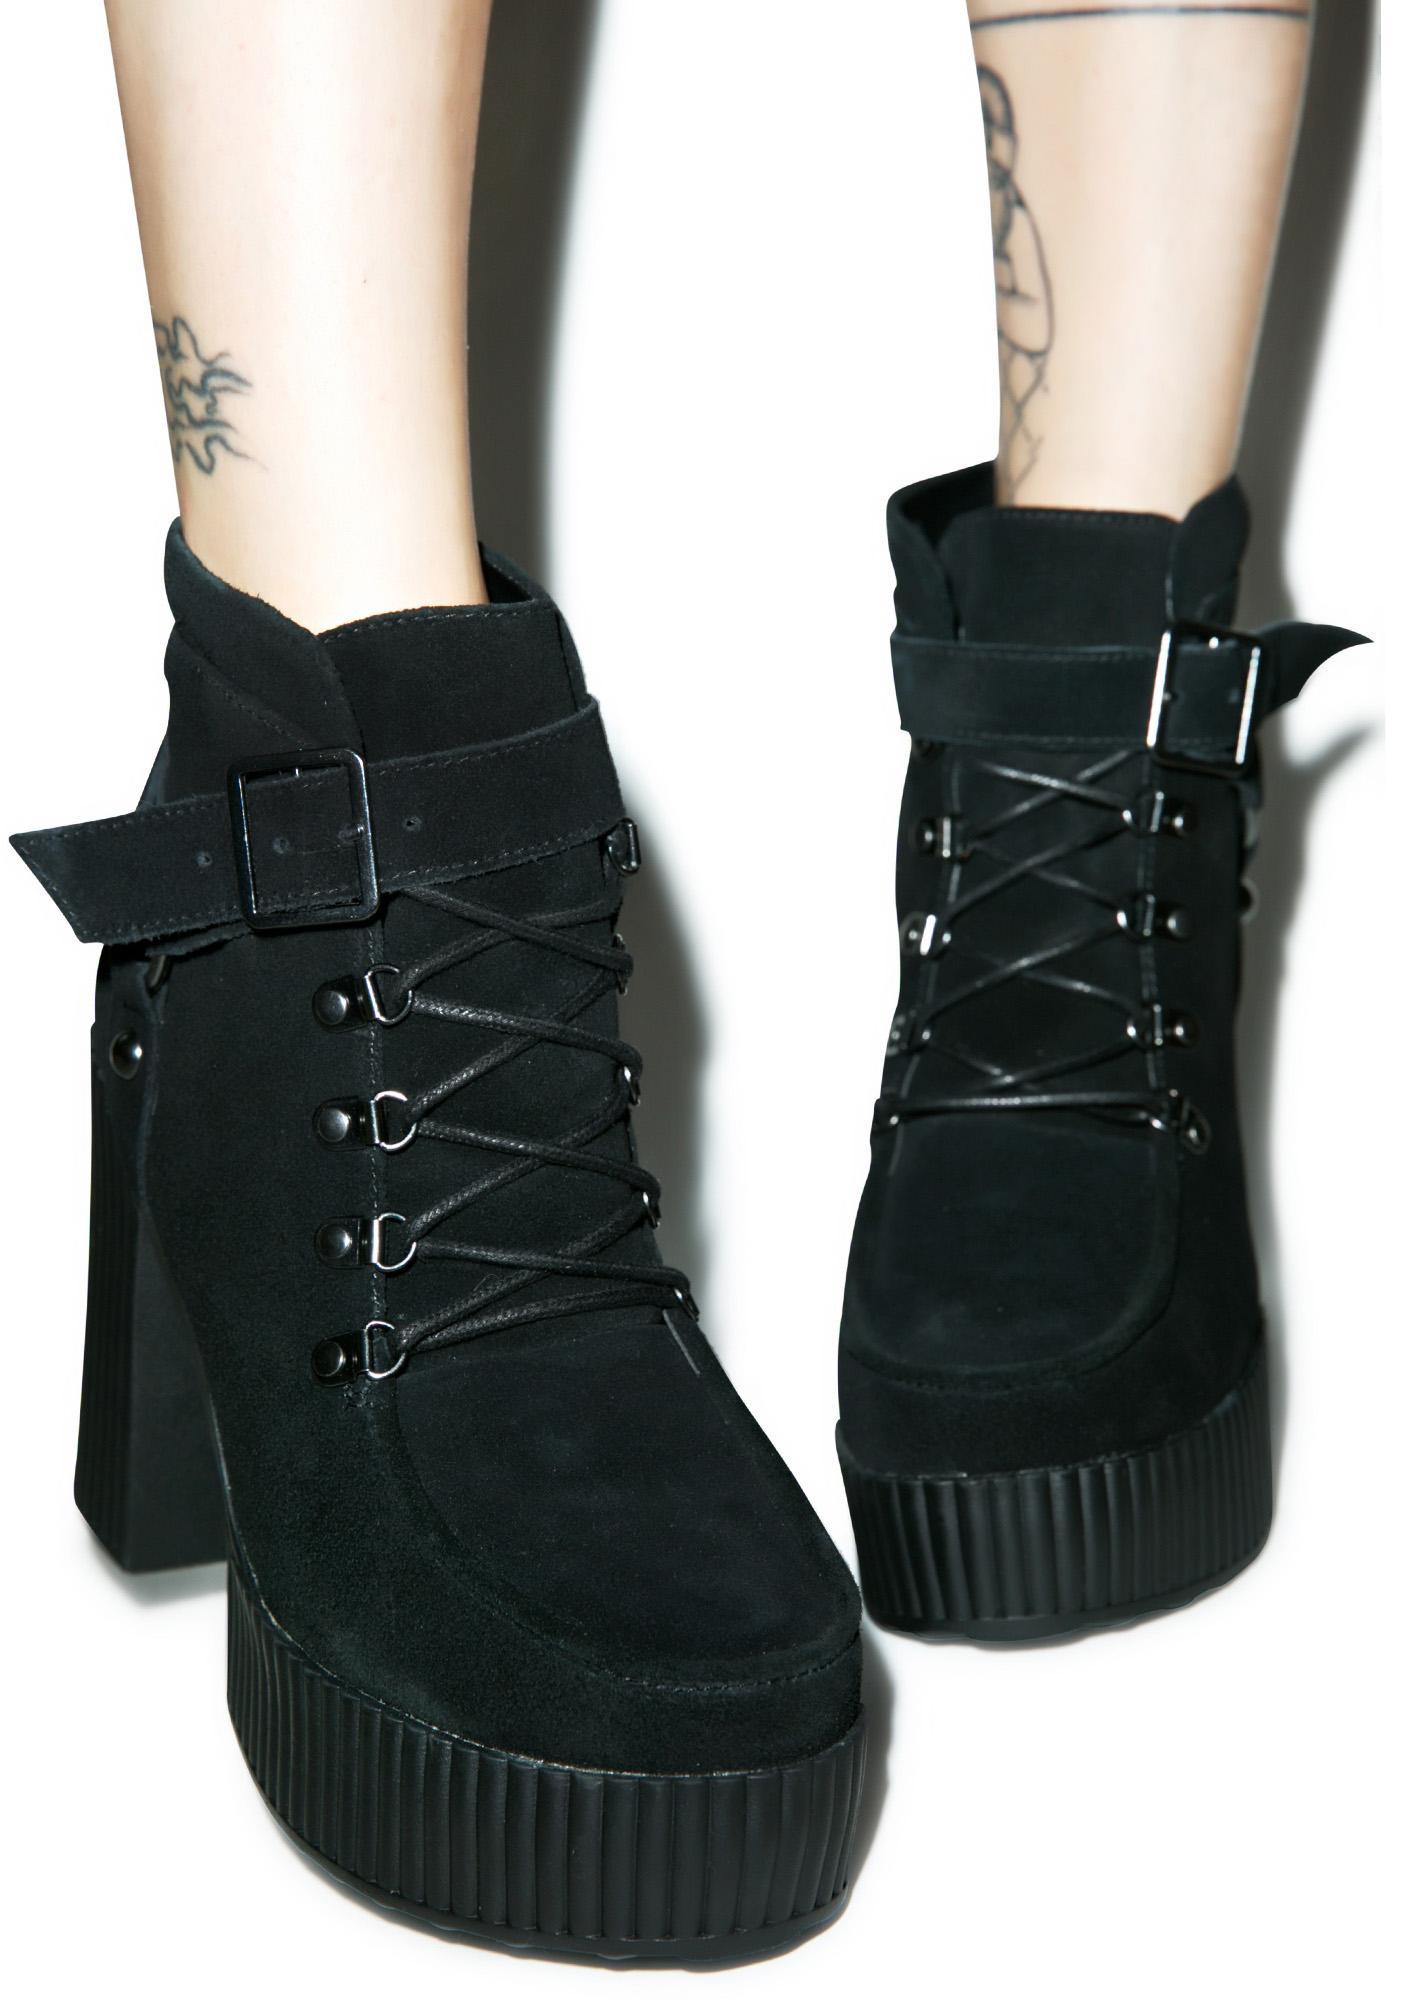 T.U.K. Buckle Strap Yuni Boots